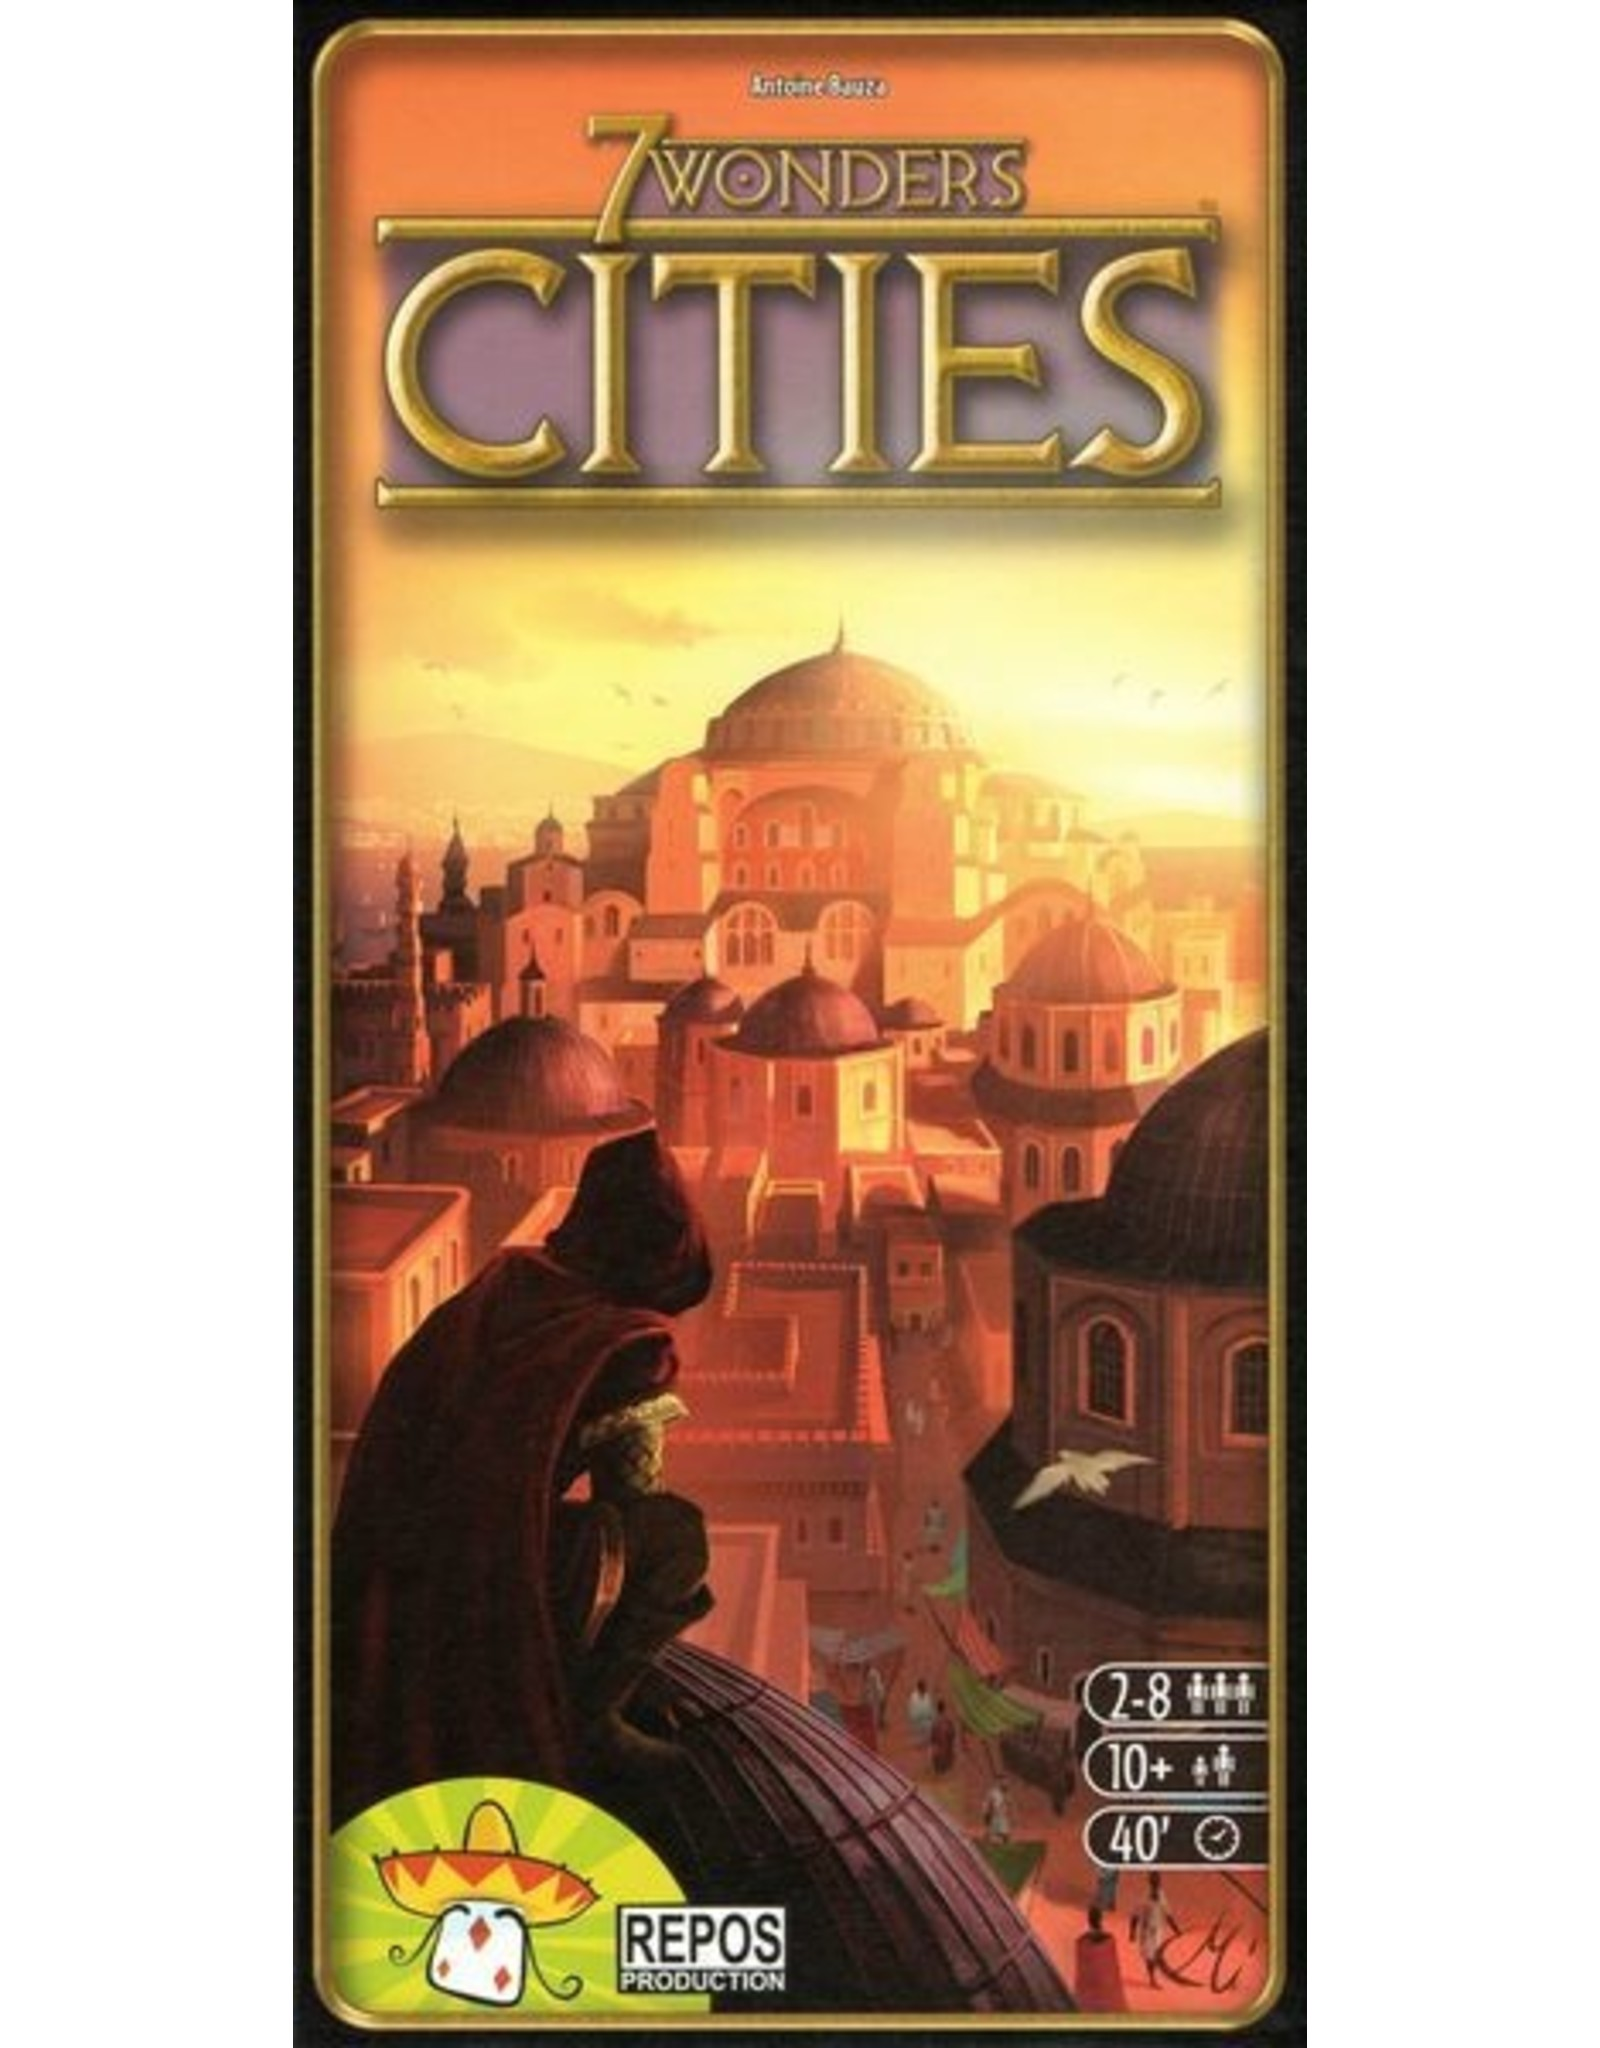 Repos 7 WONDERS: CITIES